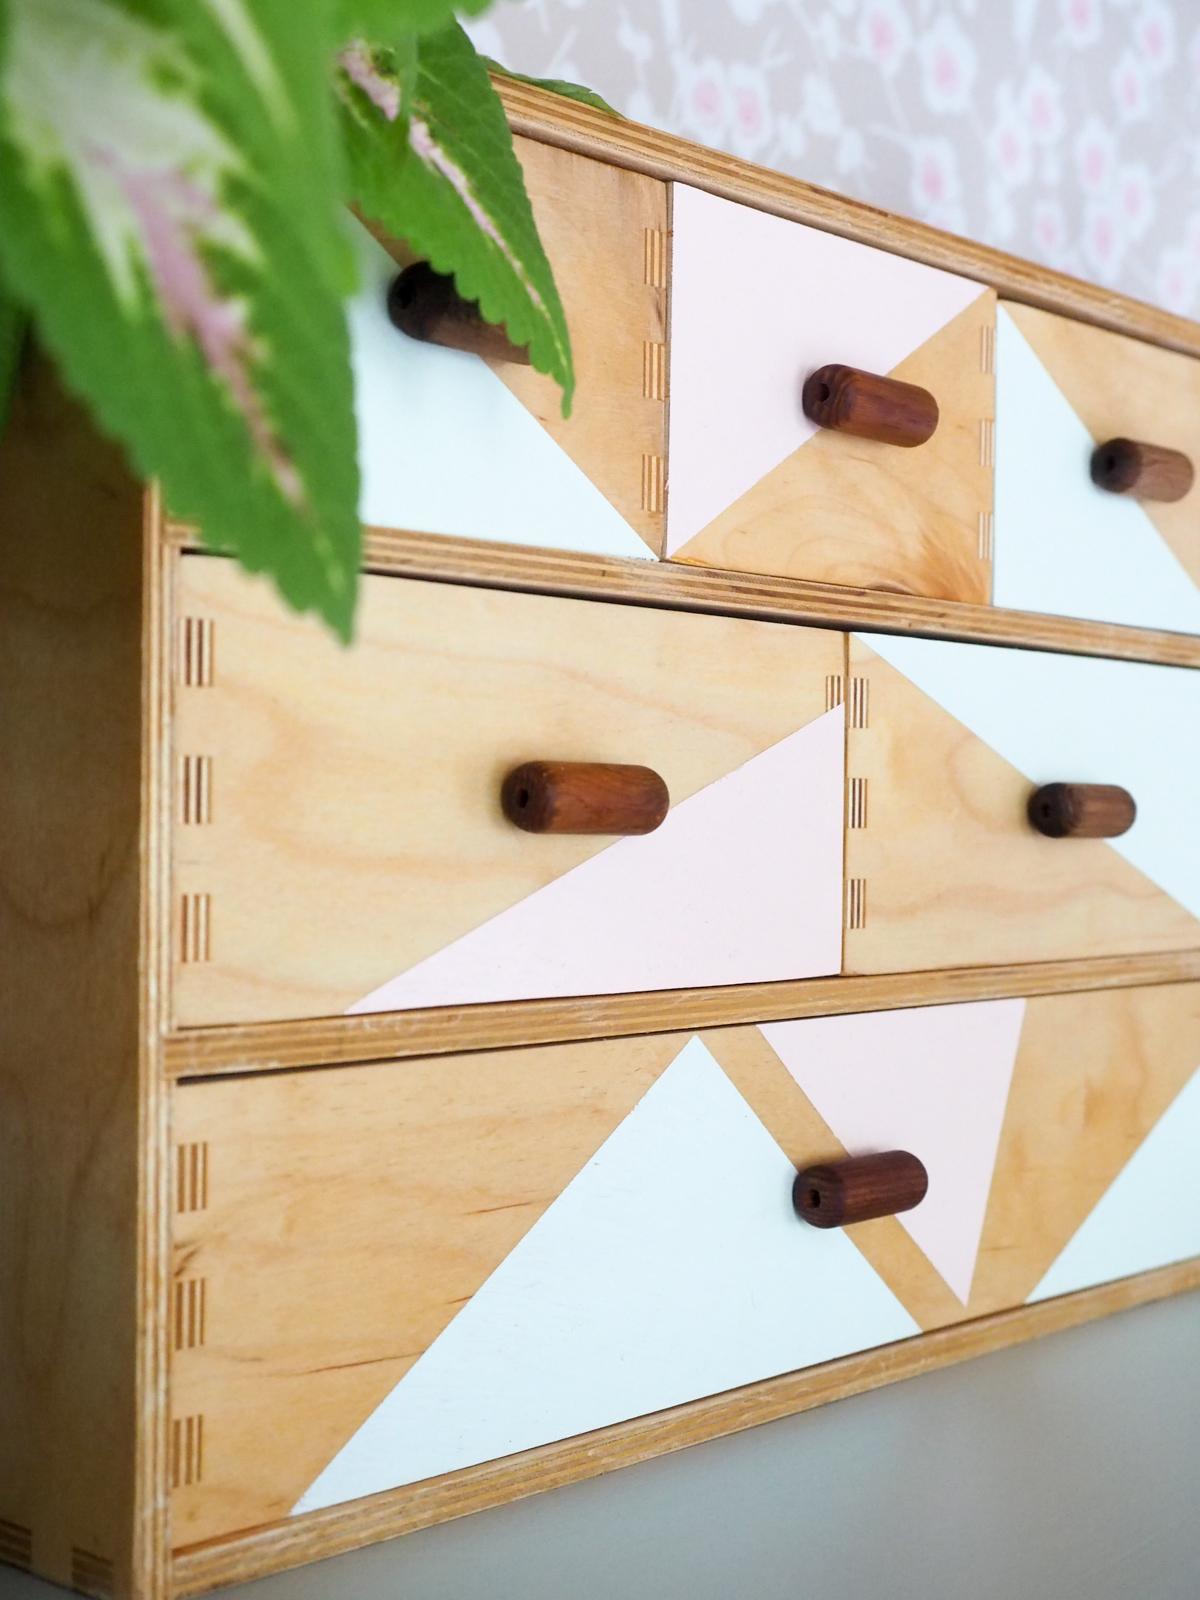 Ikea tuunaus, ikea hack